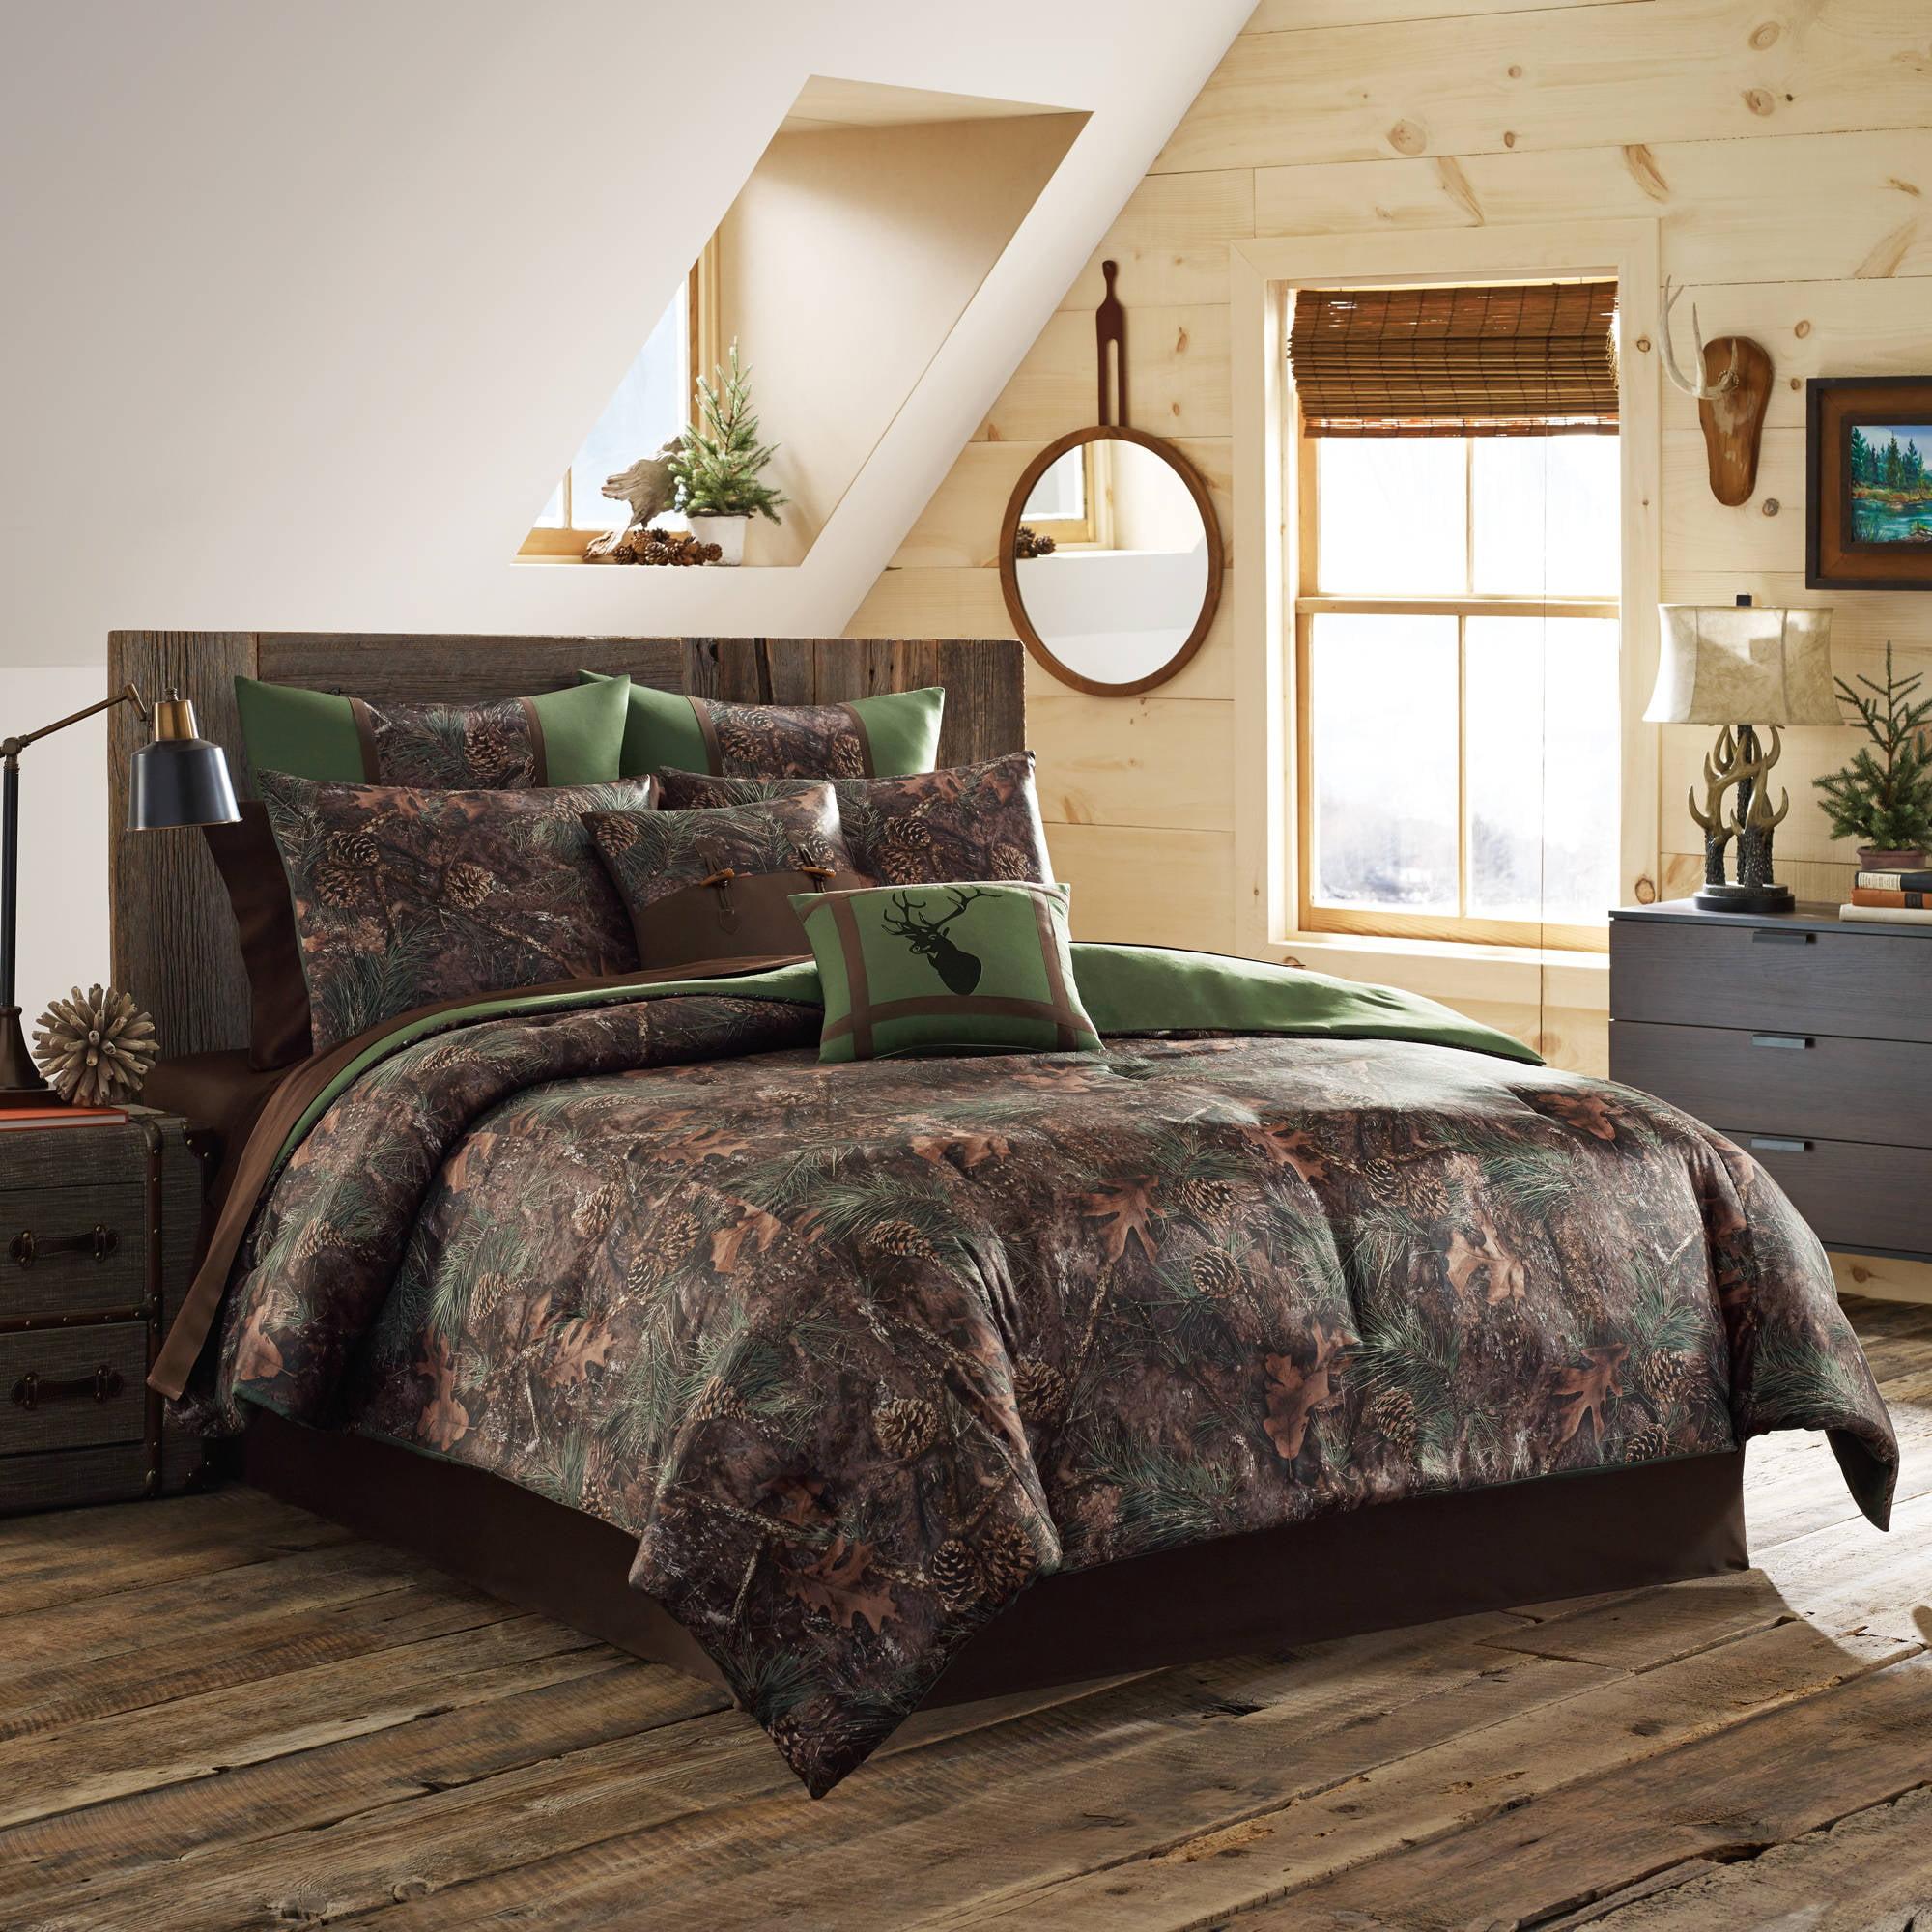 Green and brown bedding - Green And Brown Bedding 28